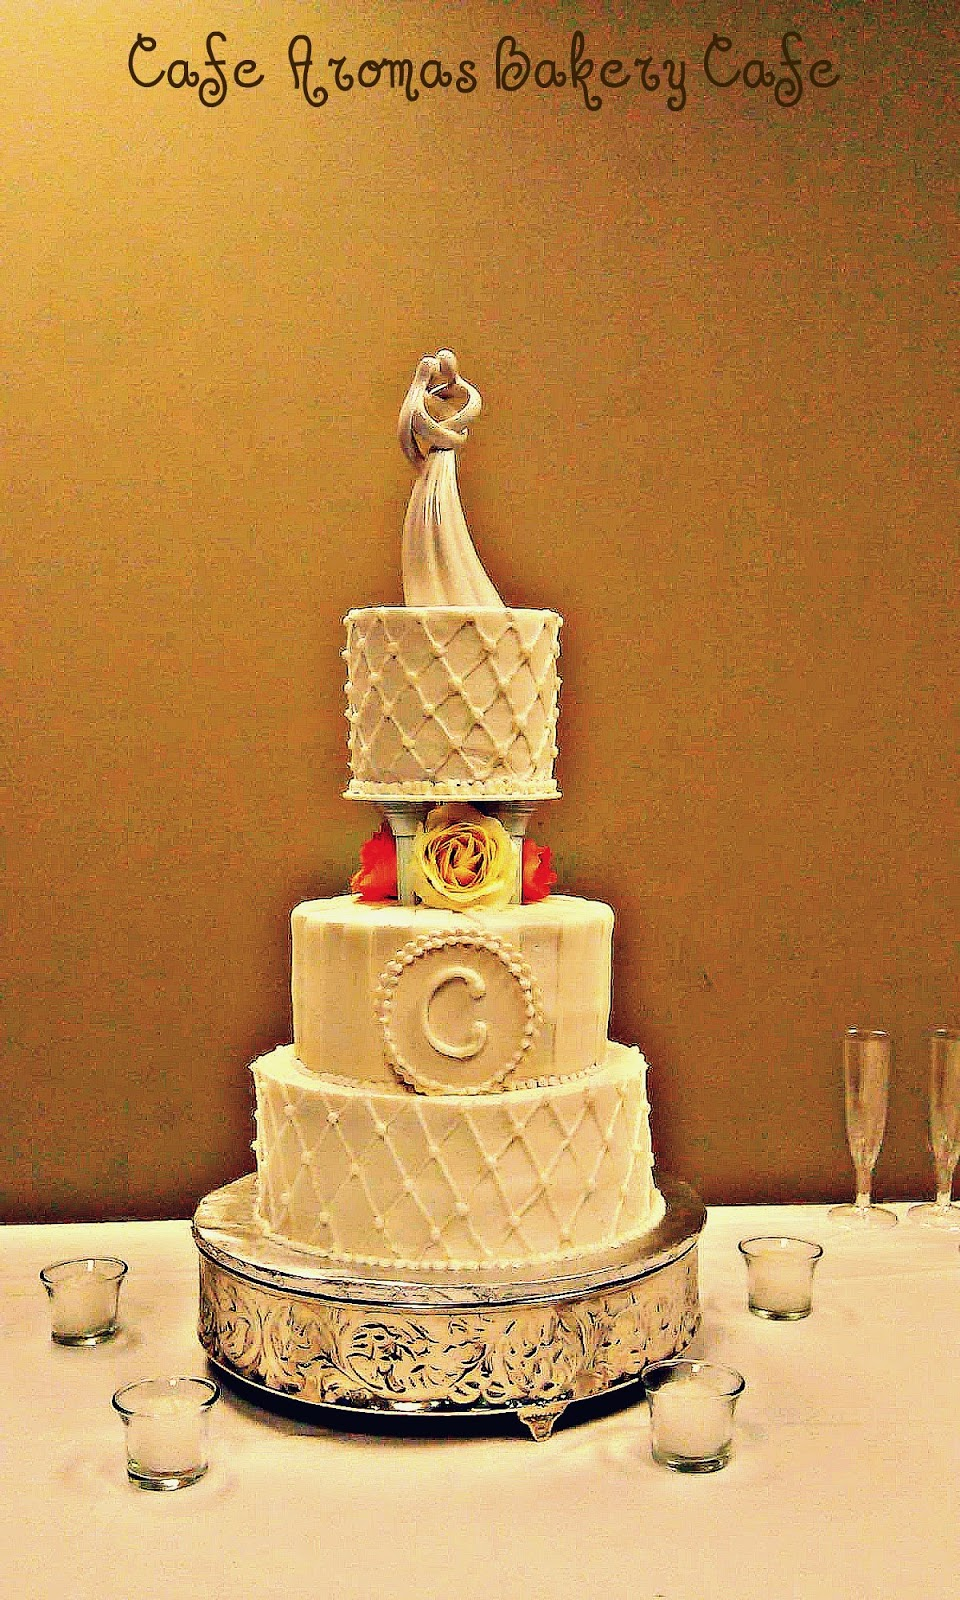 Cake Art Lawrenceville Hwy : CAFE AROMAS: Ivory Butter cream and Fondant Wedding Cake